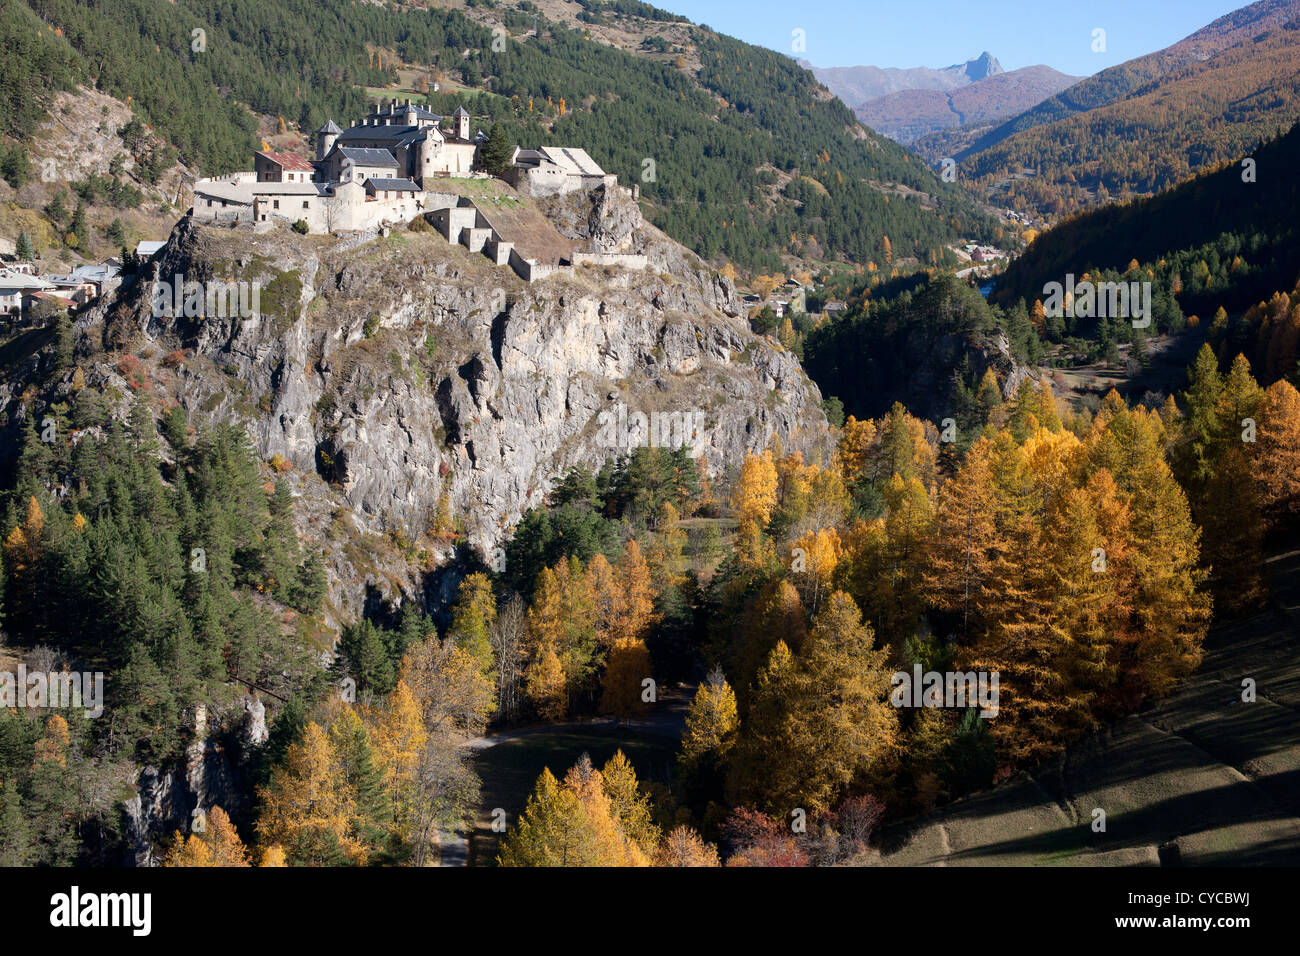 Klettersteig Chateau Queyras : Chateau queyras stockfotos & bilder alamy